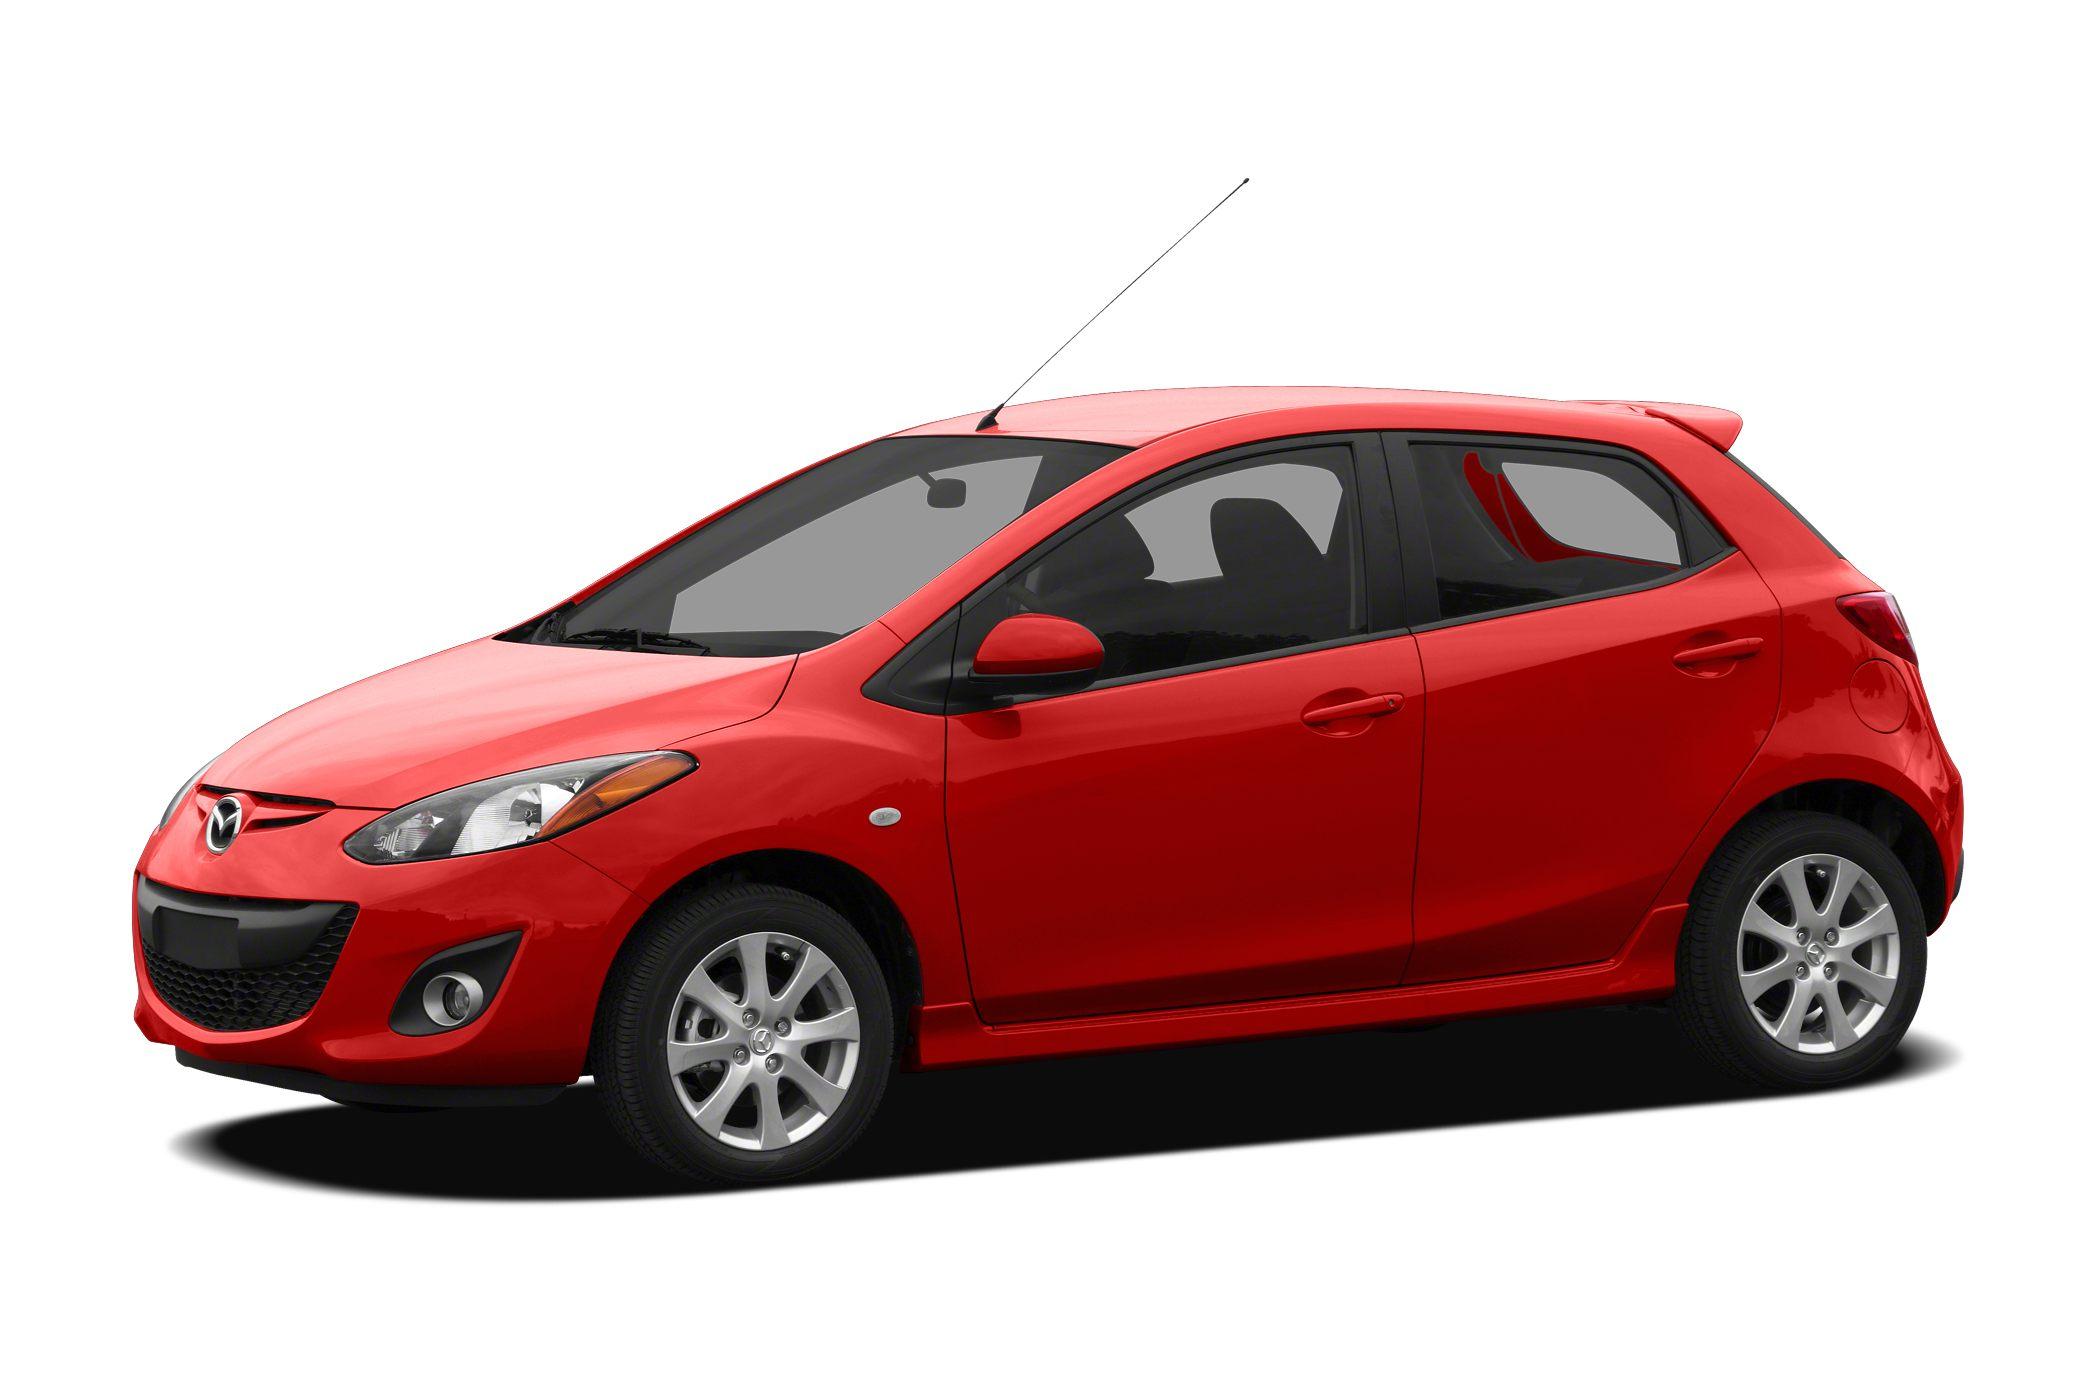 2012 Mazda Mazda2 Sport Hatchback for sale in Greenville for $0 with 35,227 miles